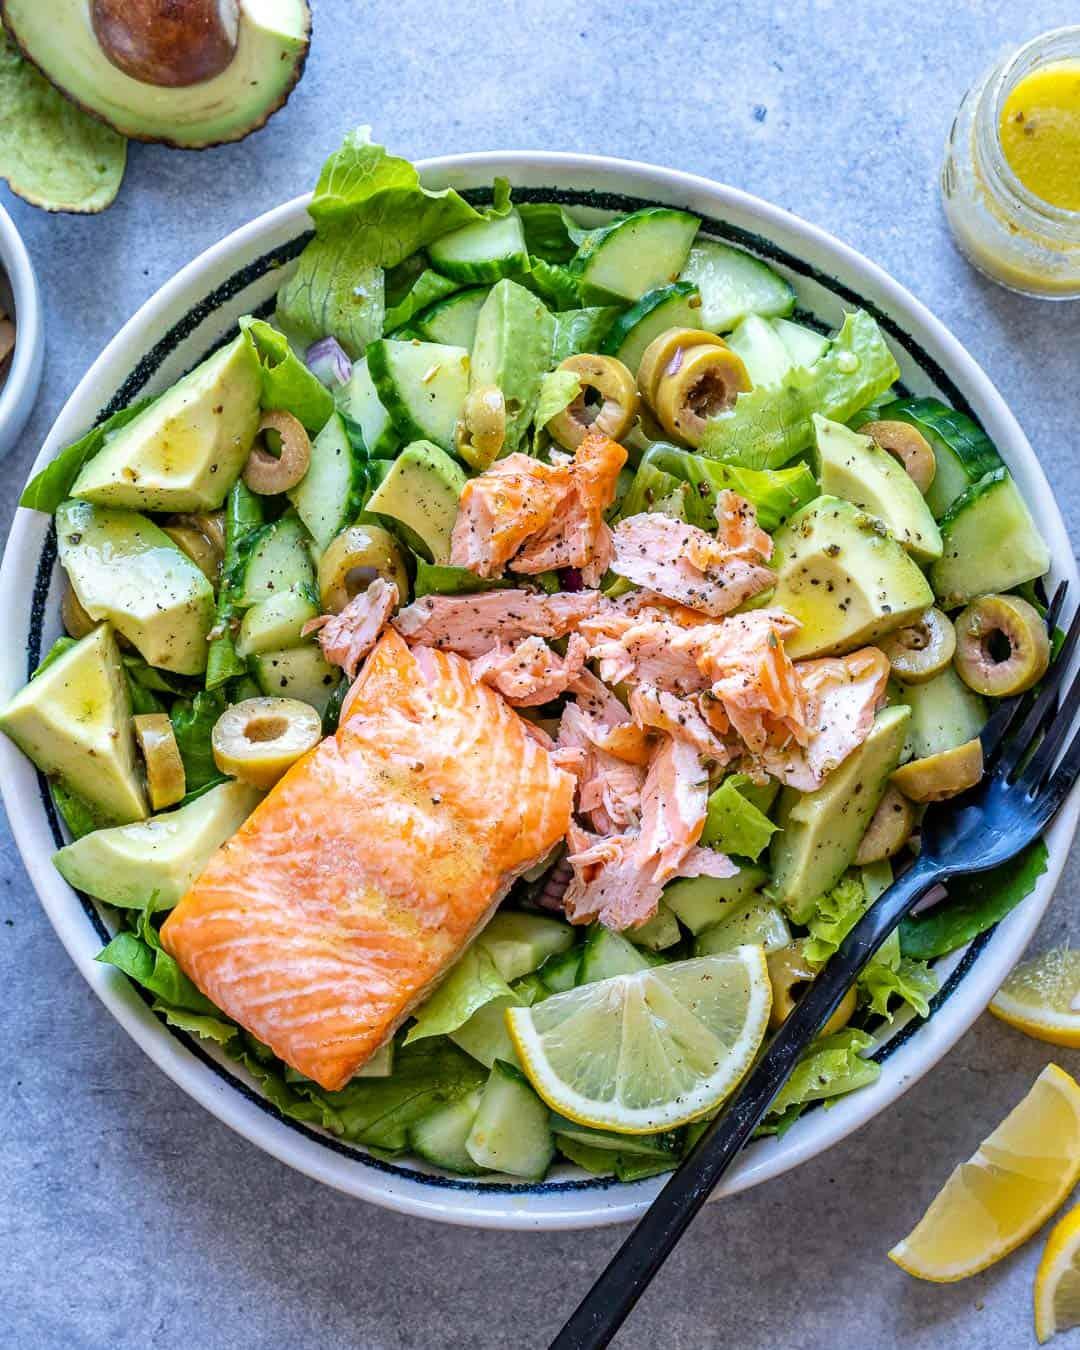 salmon topped over salad bowl